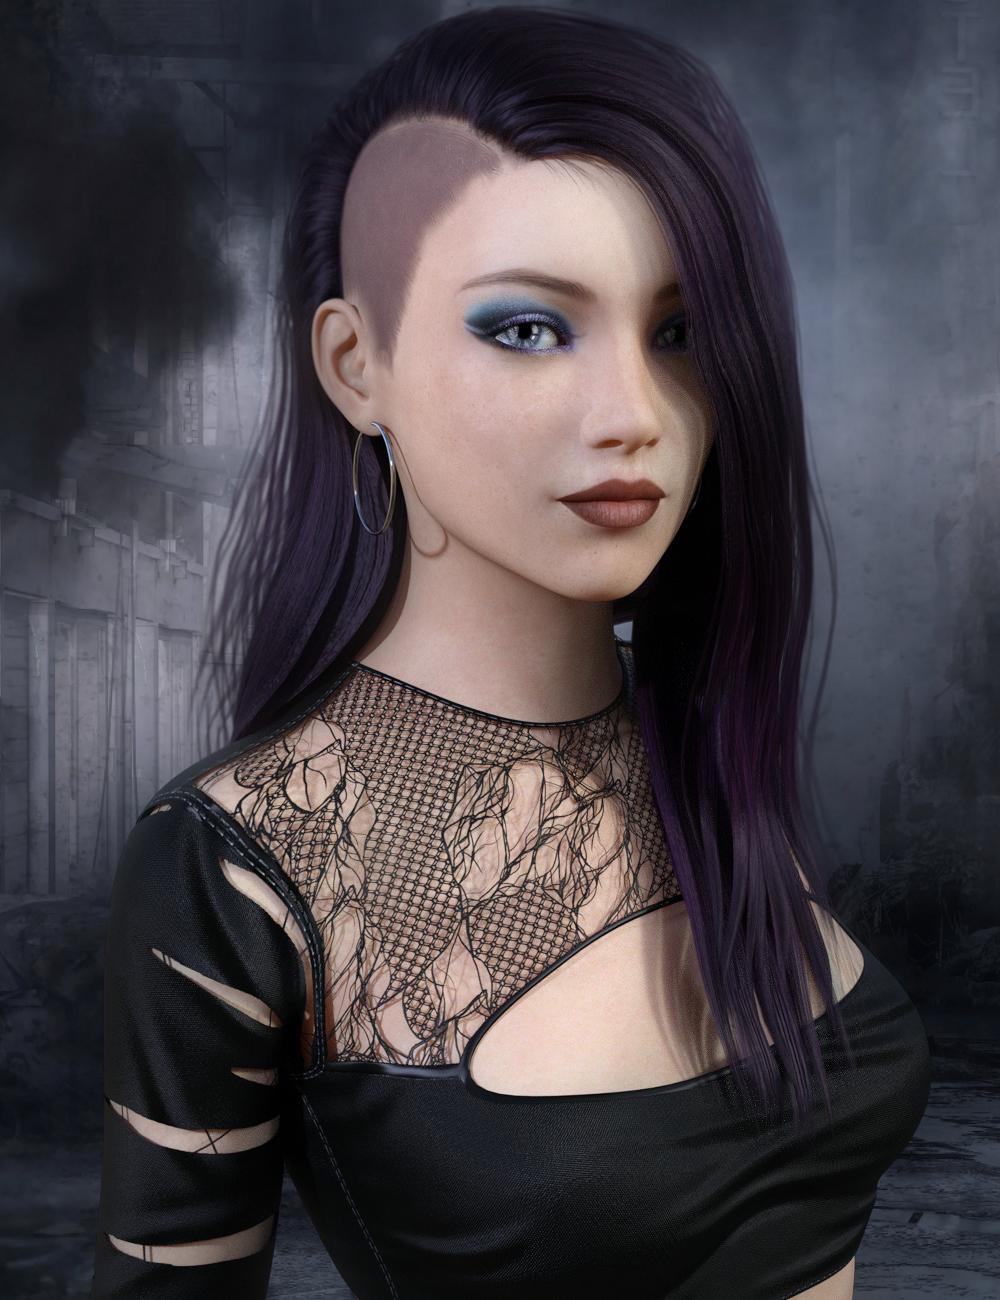 jett-hair-for-genesis-8-females-00-main-